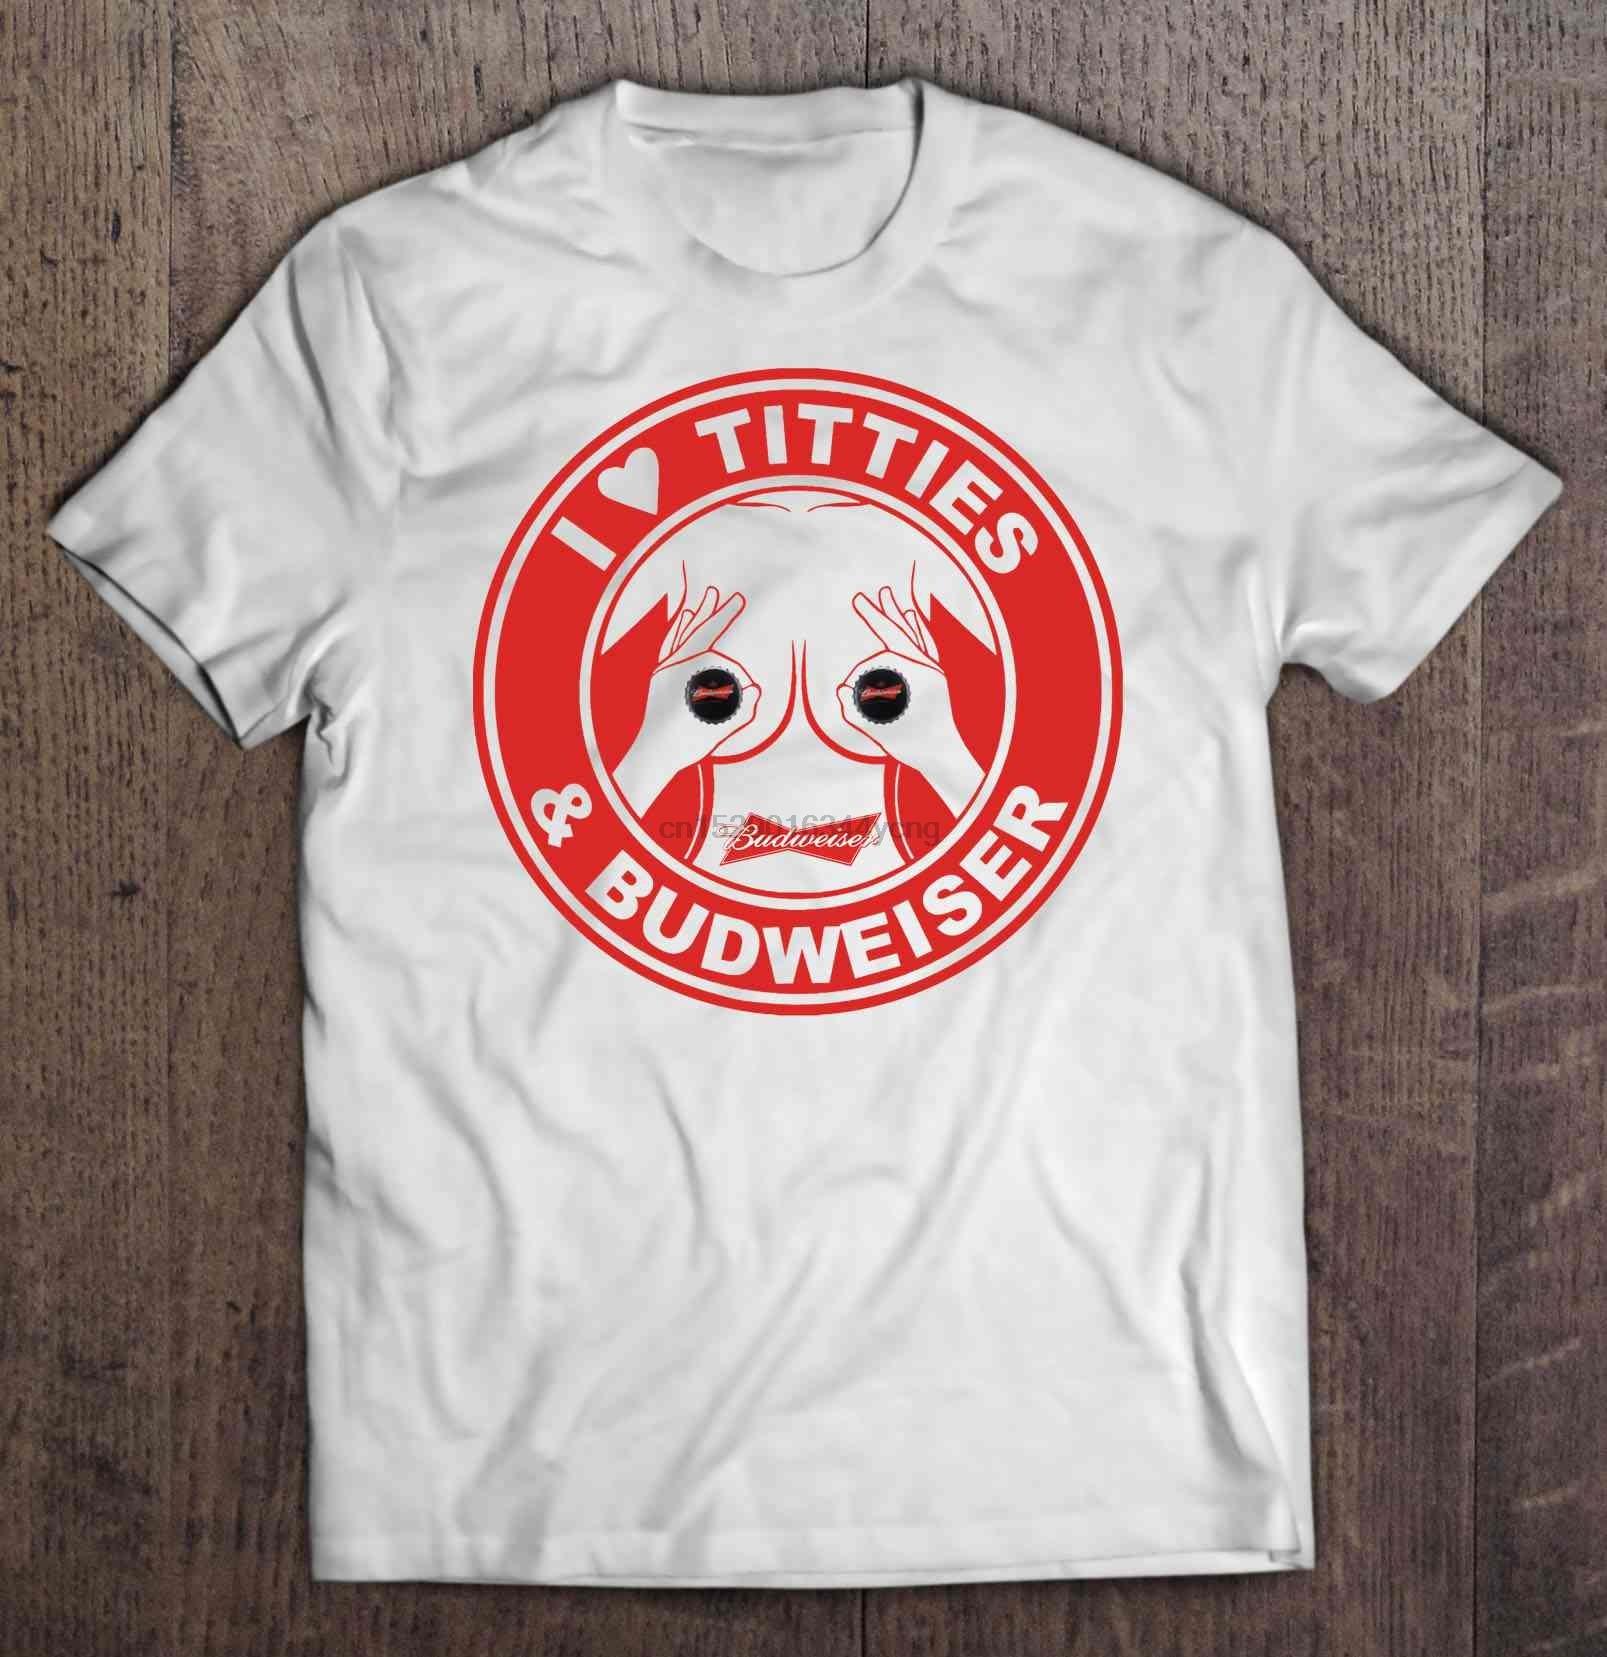 Men Funny T Shirt Fashion tshirt I Love Titties & Budweiser Women t-shirt